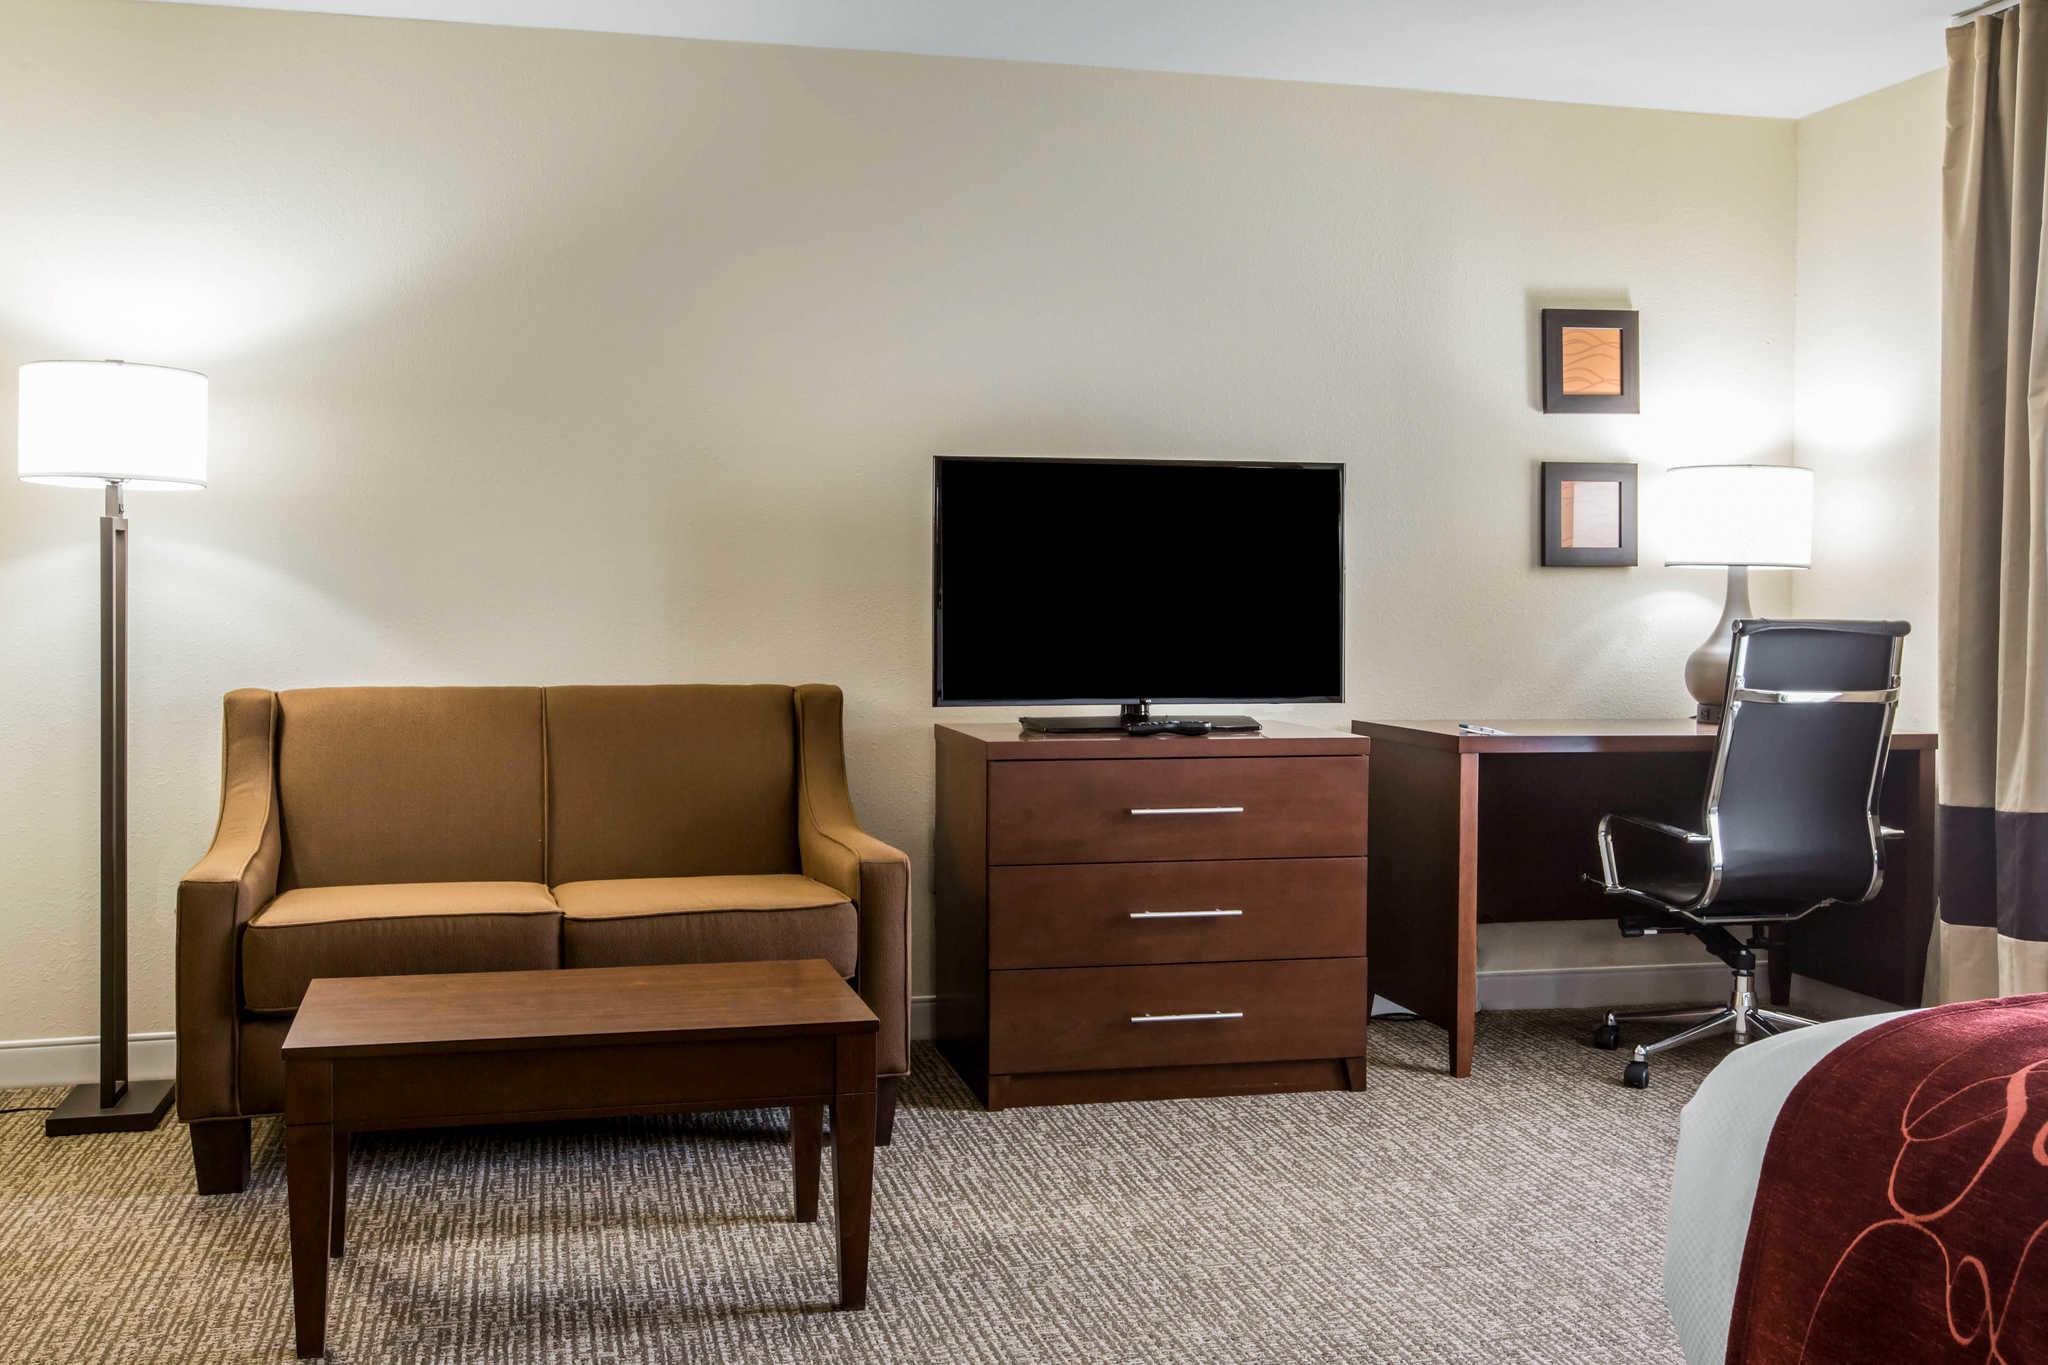 Comfort Inn & Suites West image 12